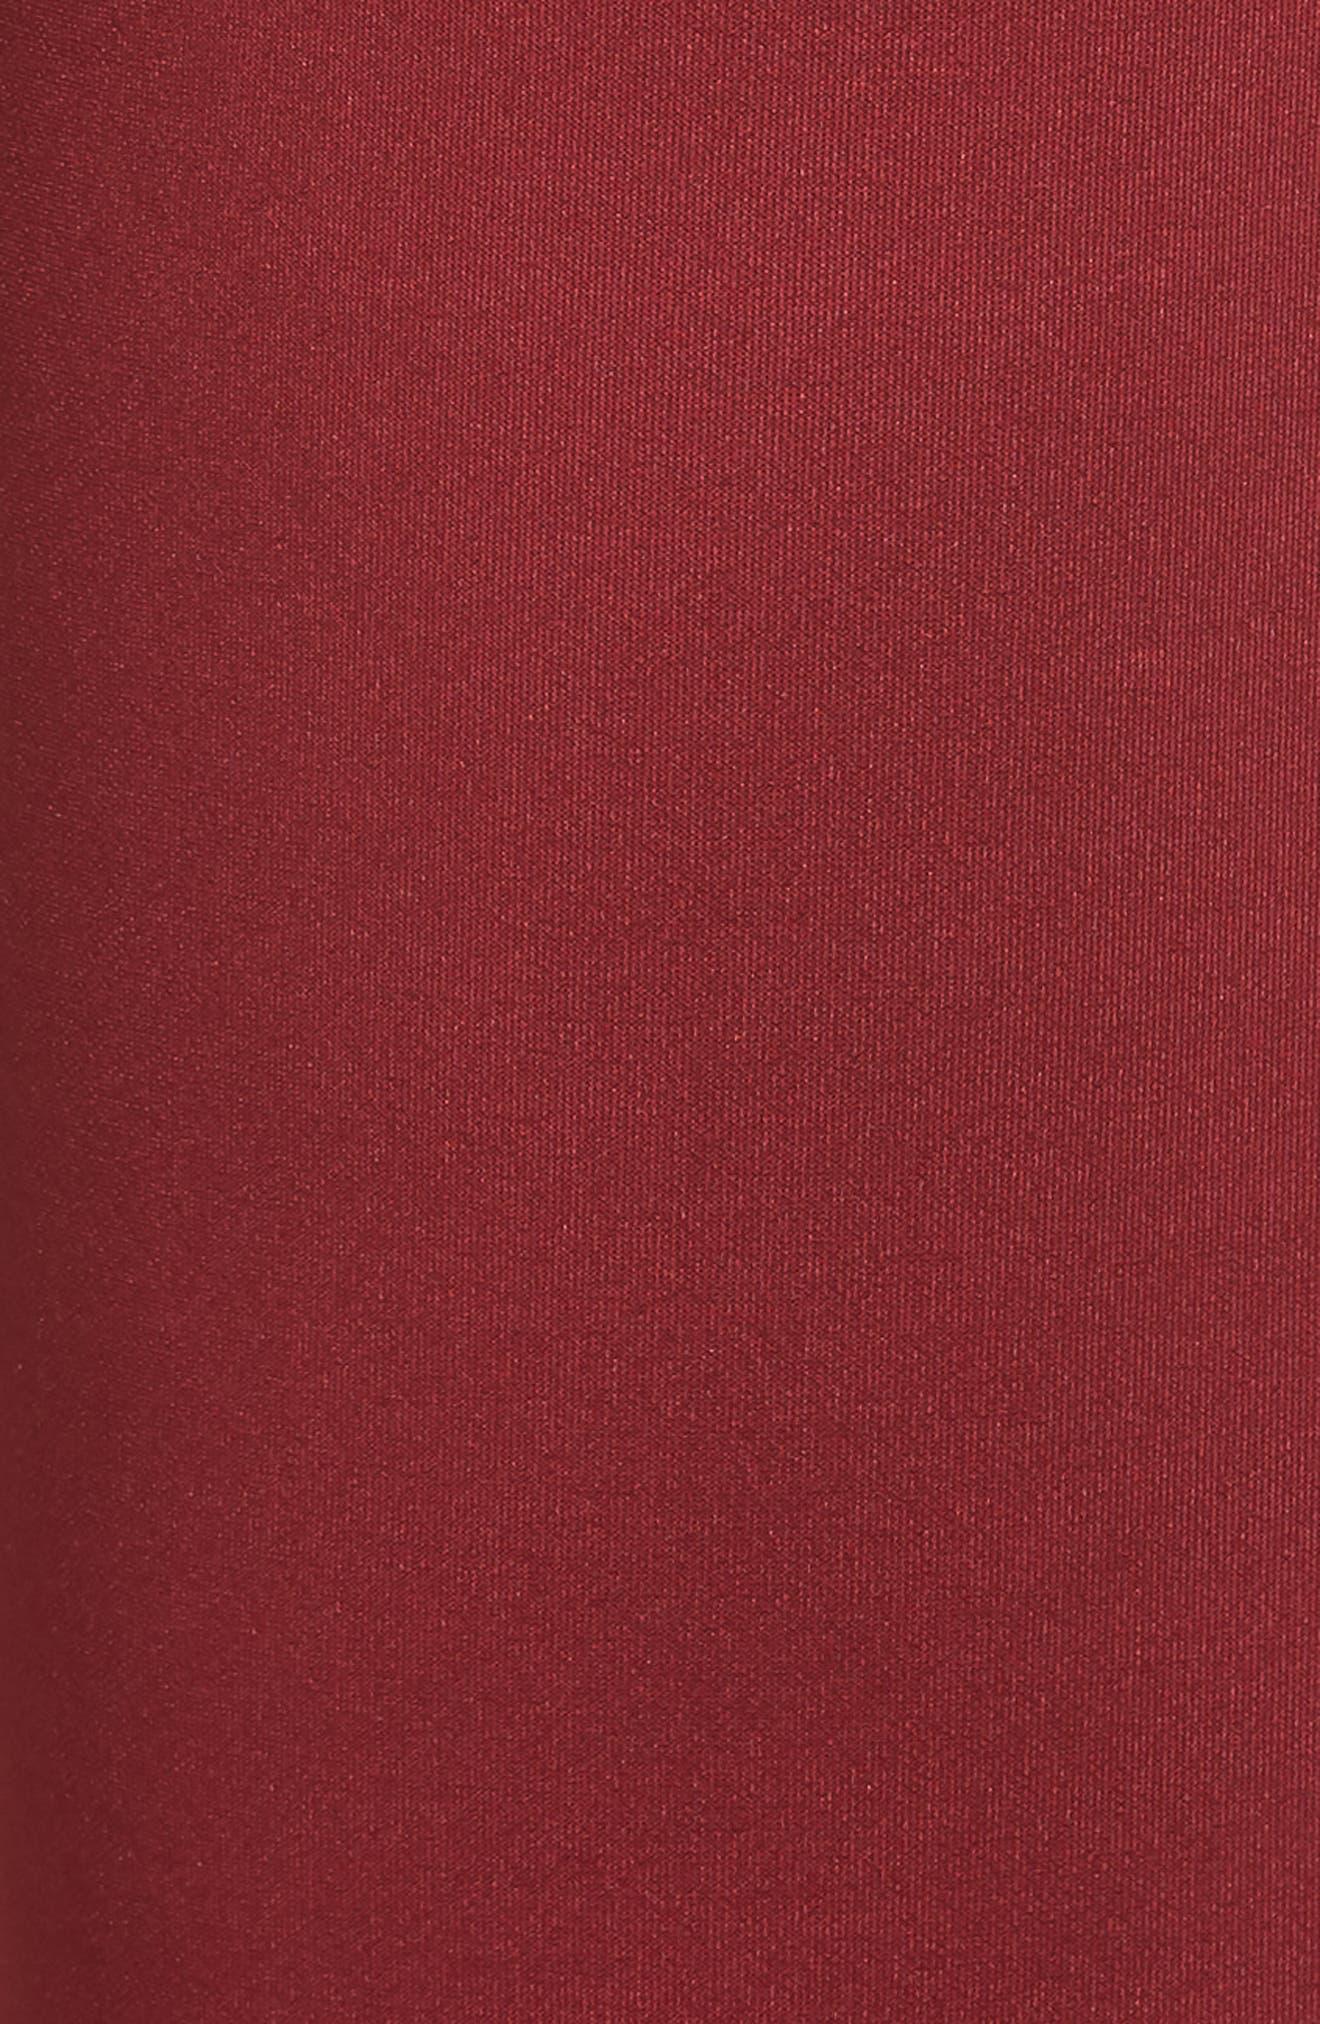 Microscuba Side Slit Track Pants,                             Alternate thumbnail 5, color,                             BURGUNDY